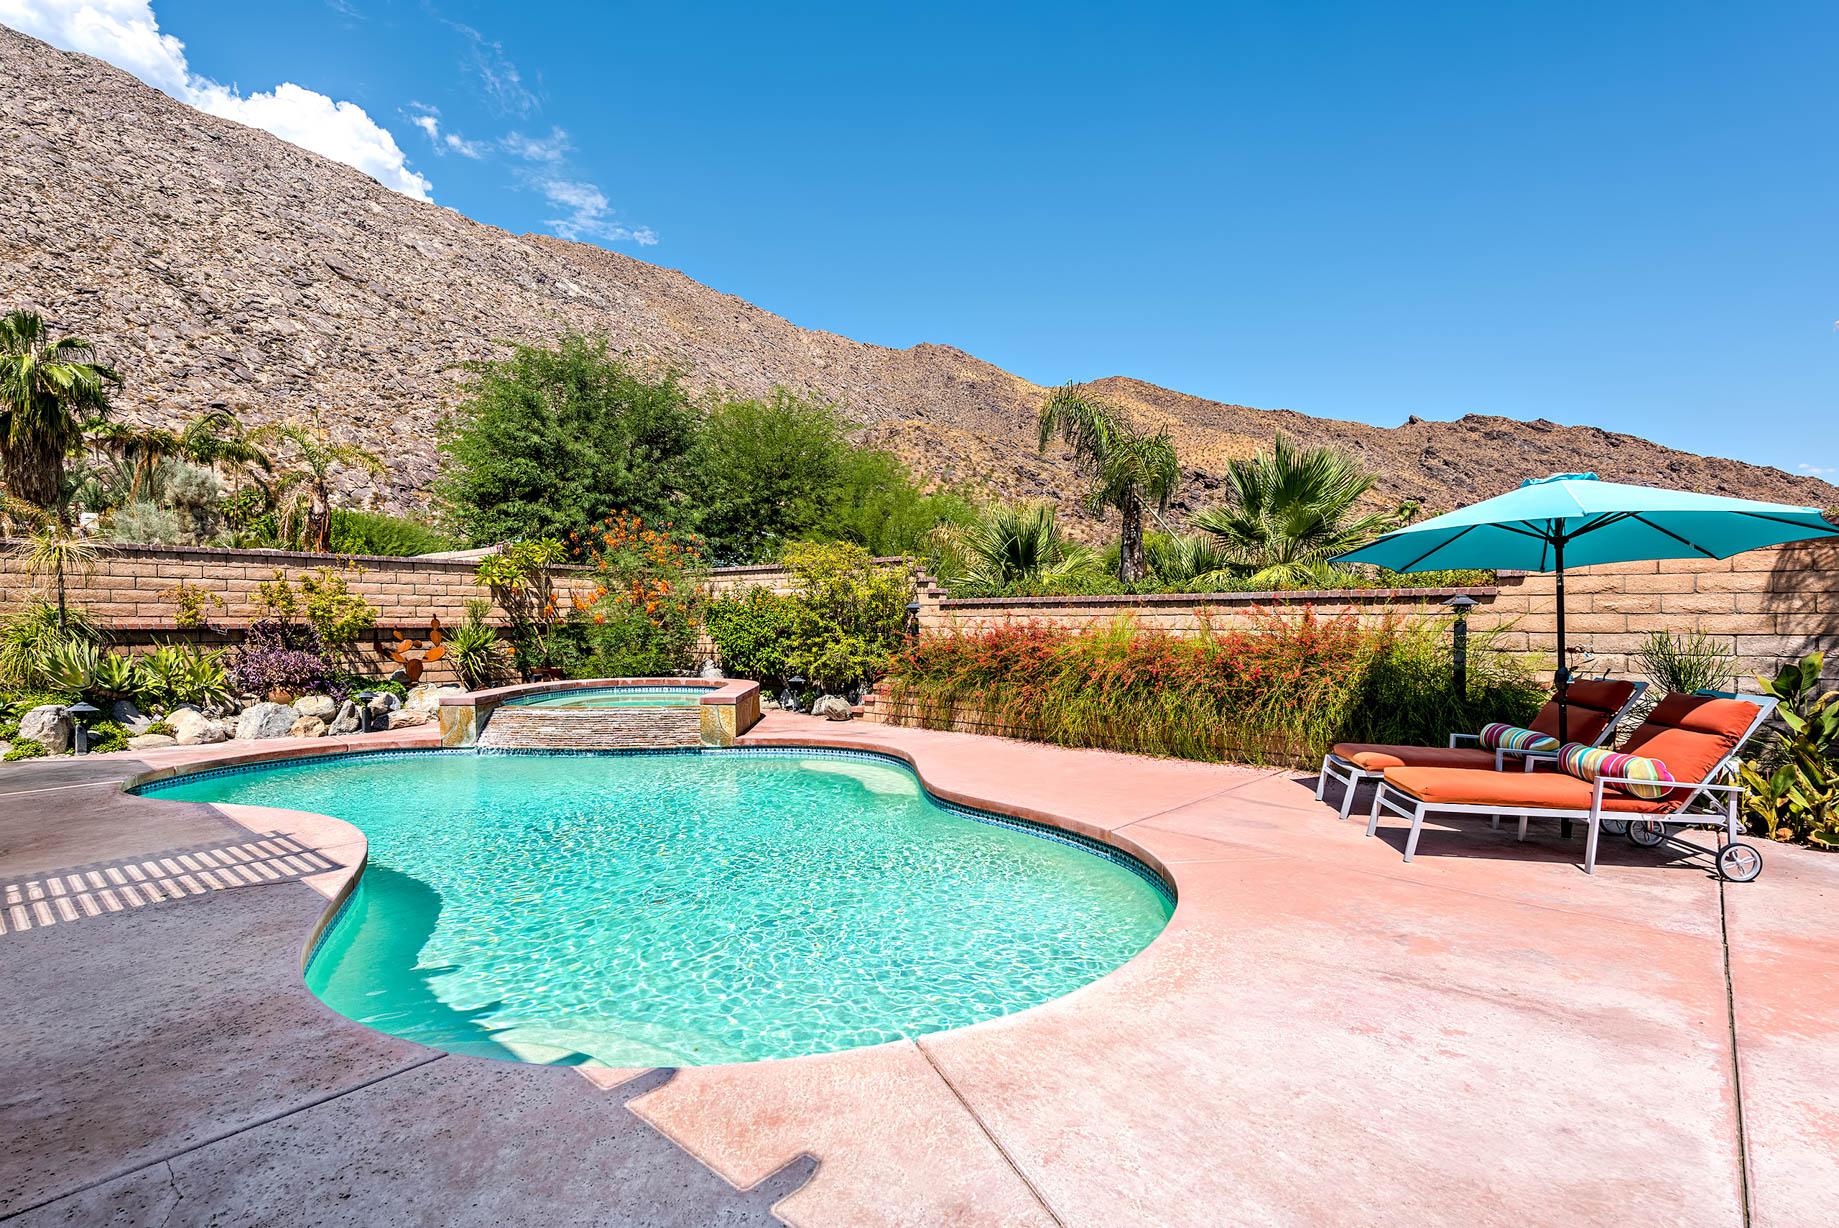 Desert Modern - 575 S Fern, Canyon Dr, Palm Springs, CA, USA